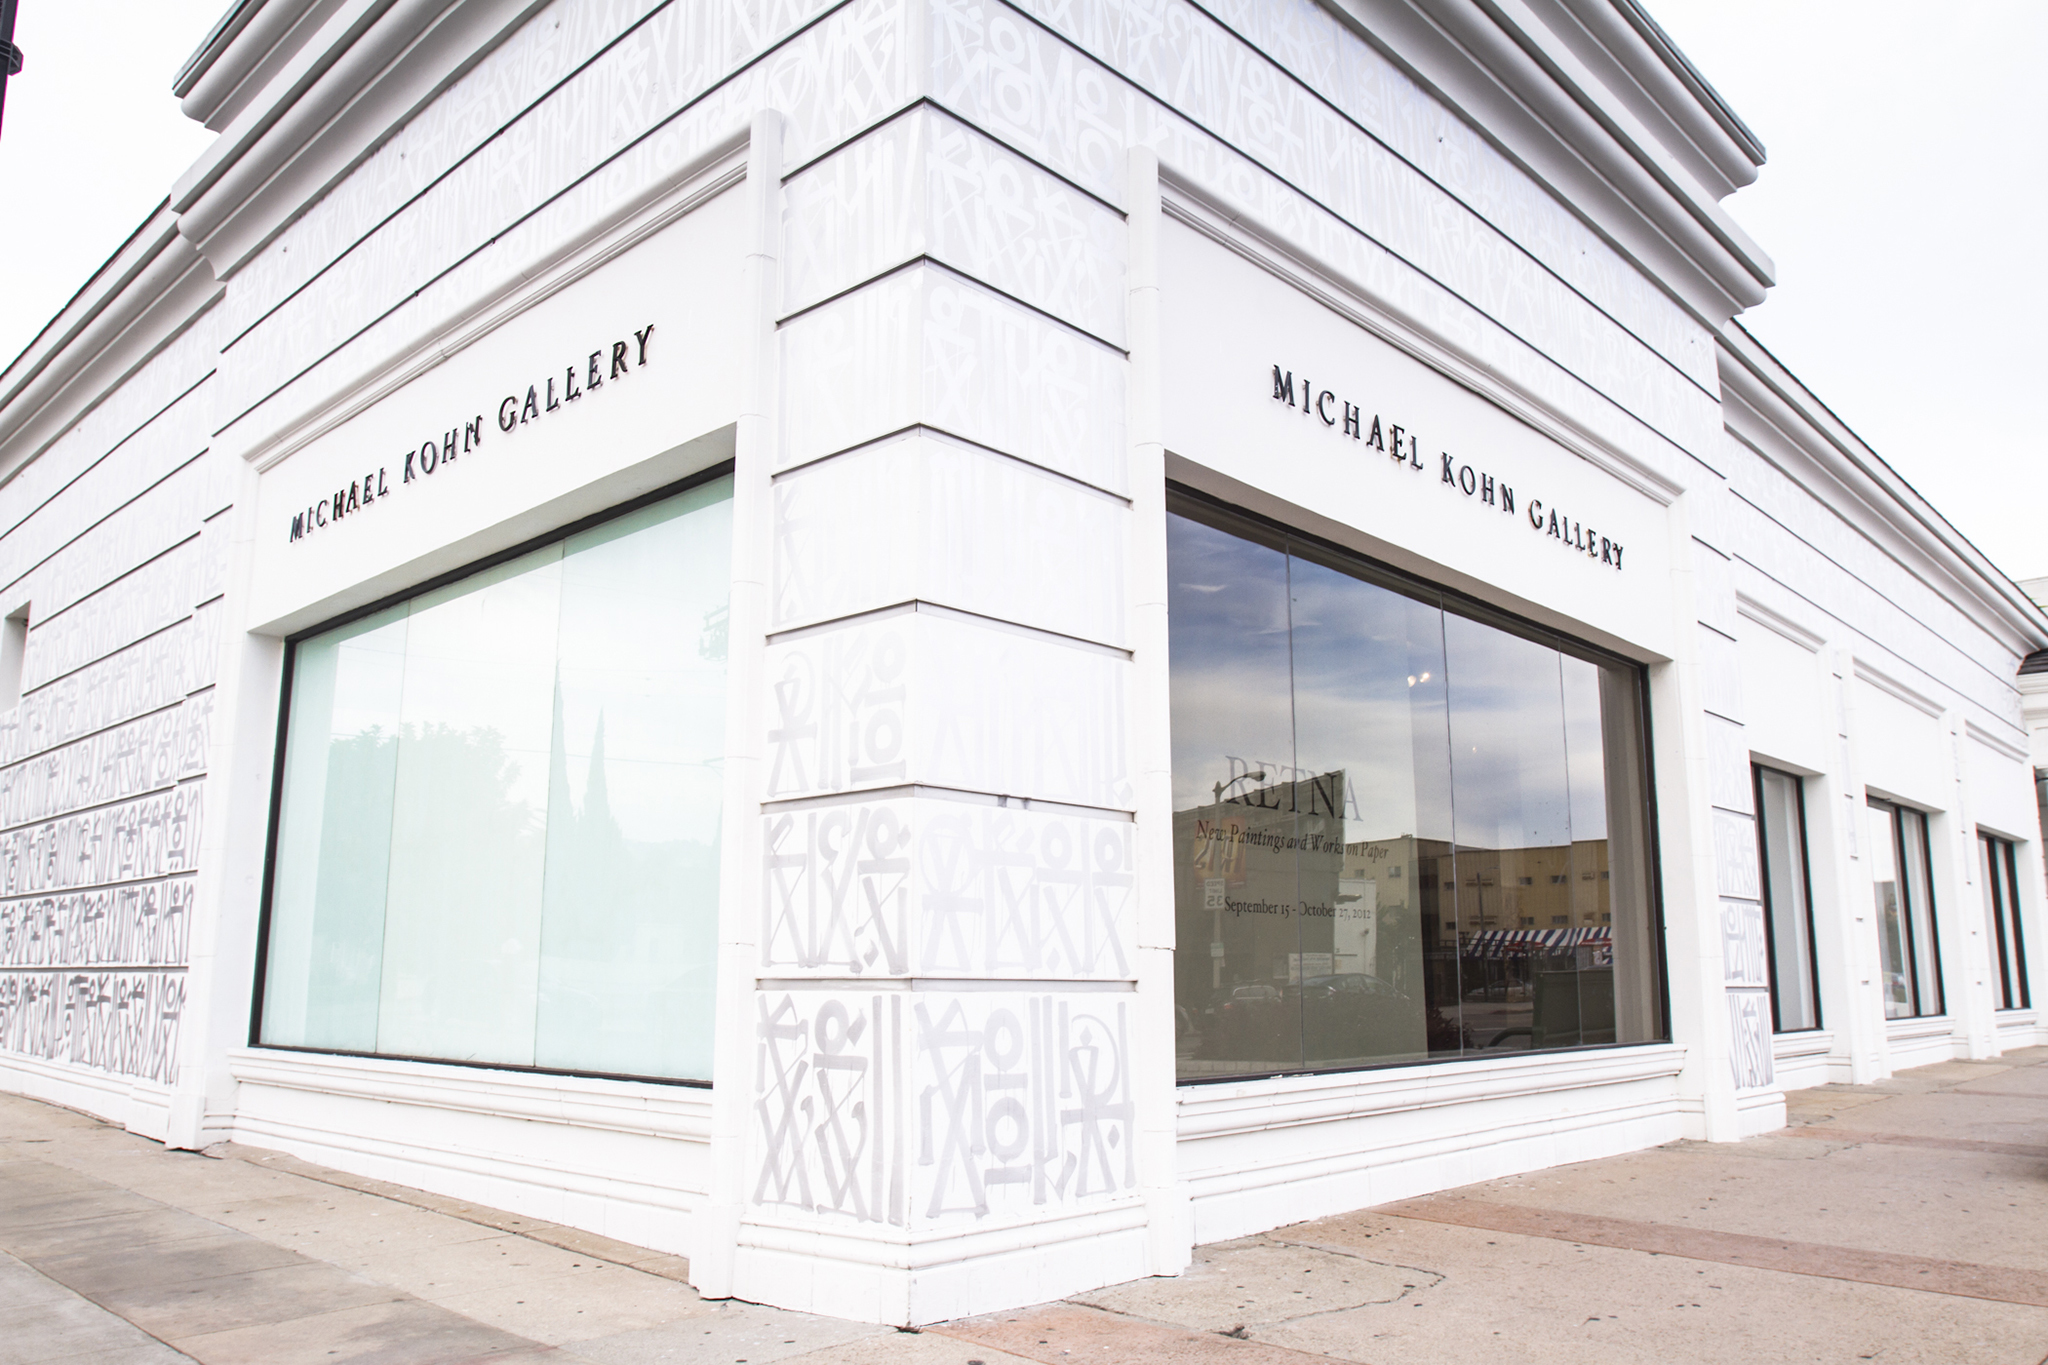 Michael Kohn Gallery